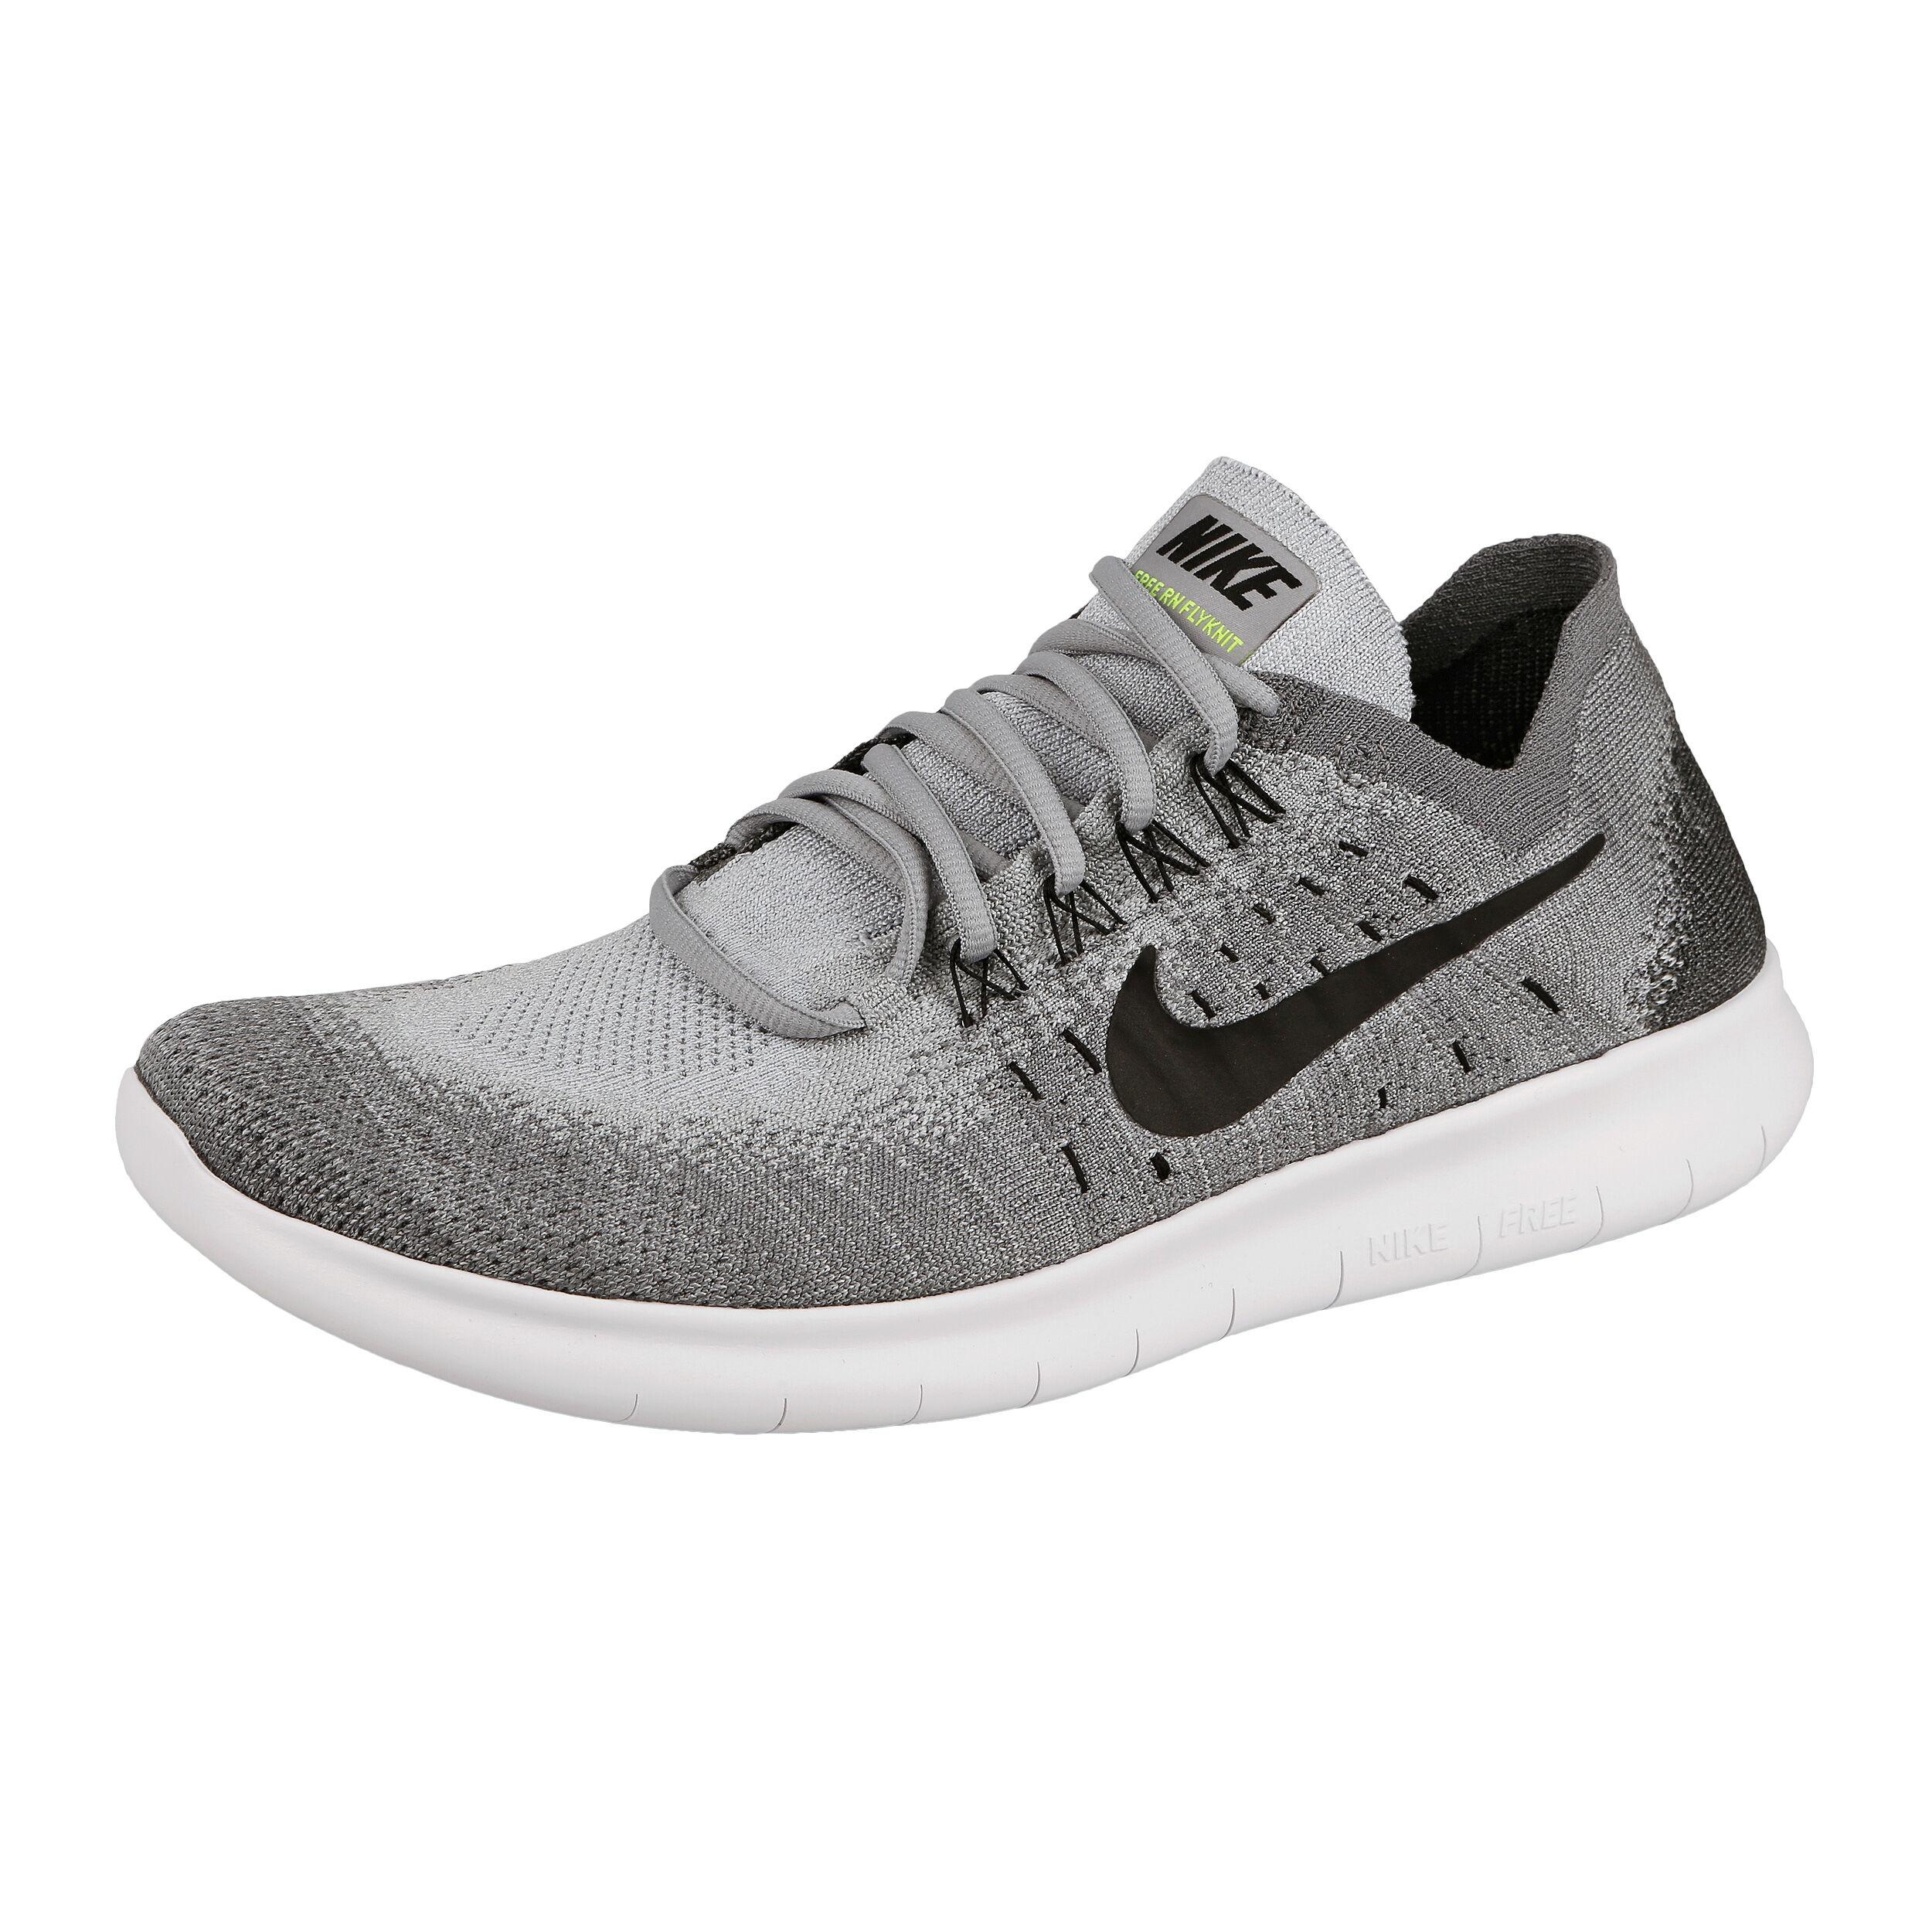 Nike Free Run Flyknit 2017 Fitnessschoen Heren Lichtgrijs, Grijs